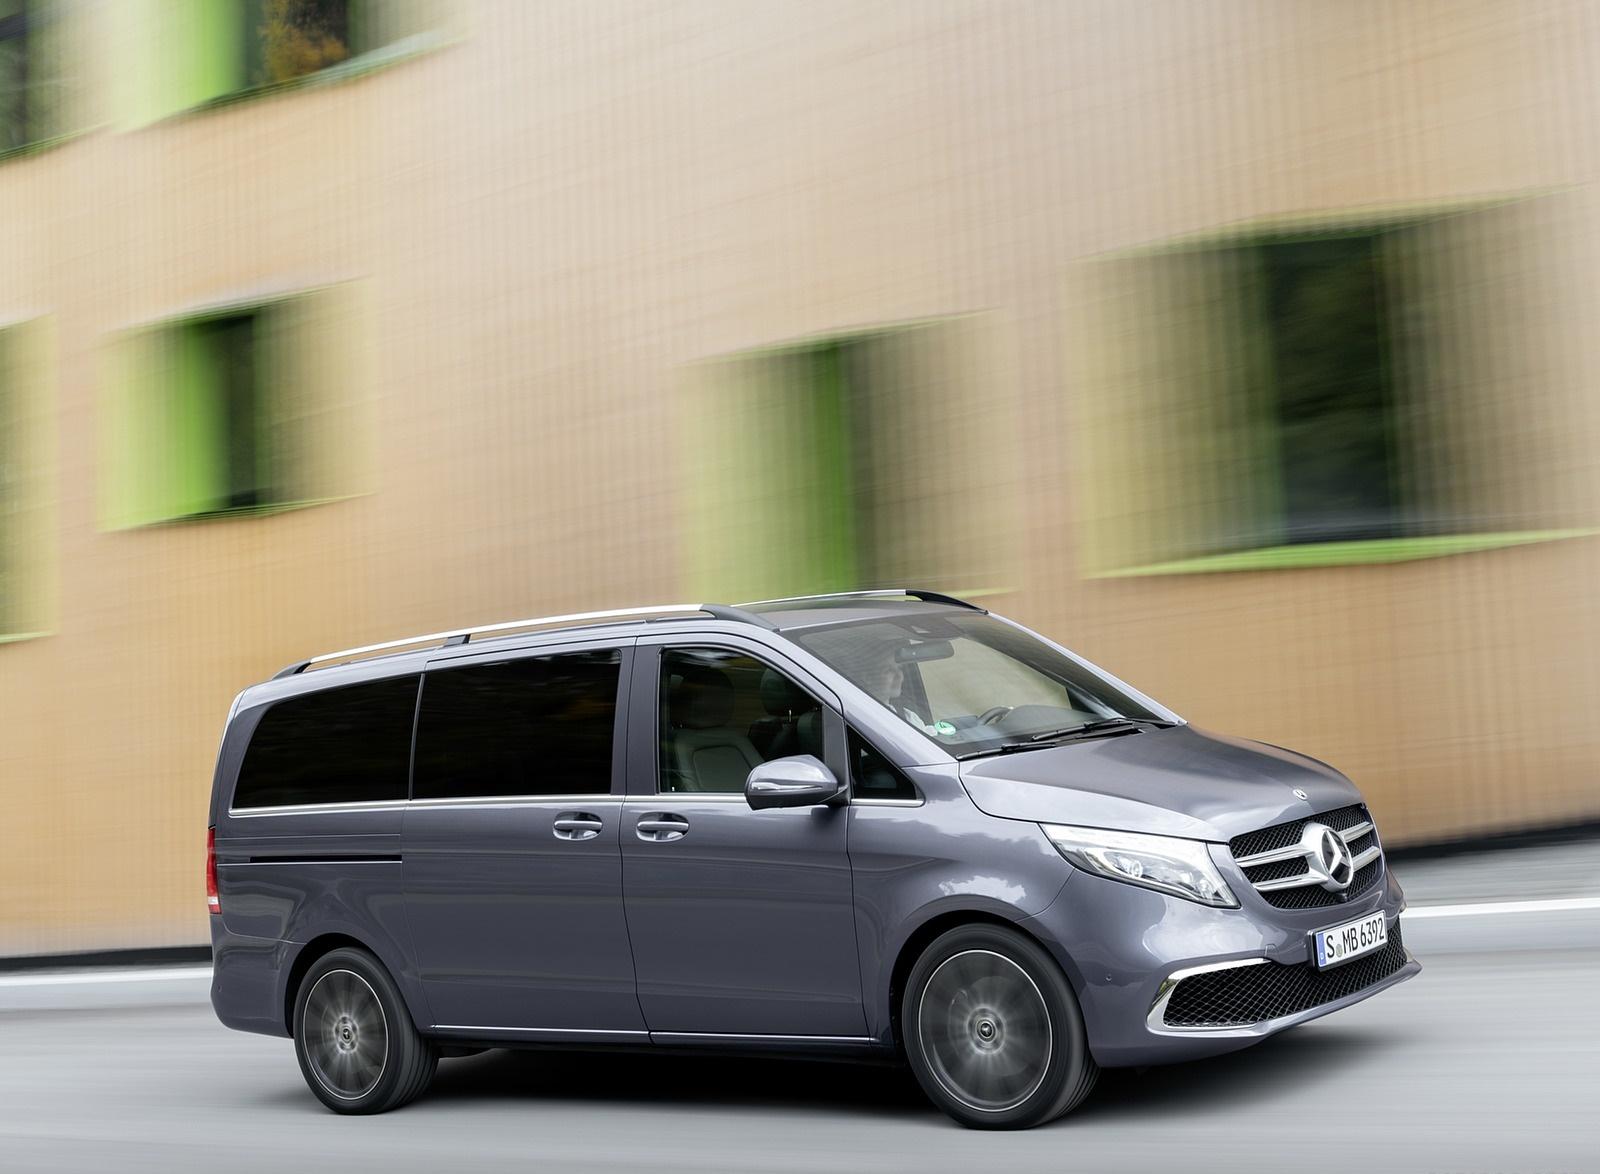 2019 Mercedes-Benz V-Class EXCLUSIVE Line (Color: Selenit Grey Metallic) Front Three-Quarter Wallpapers (9)